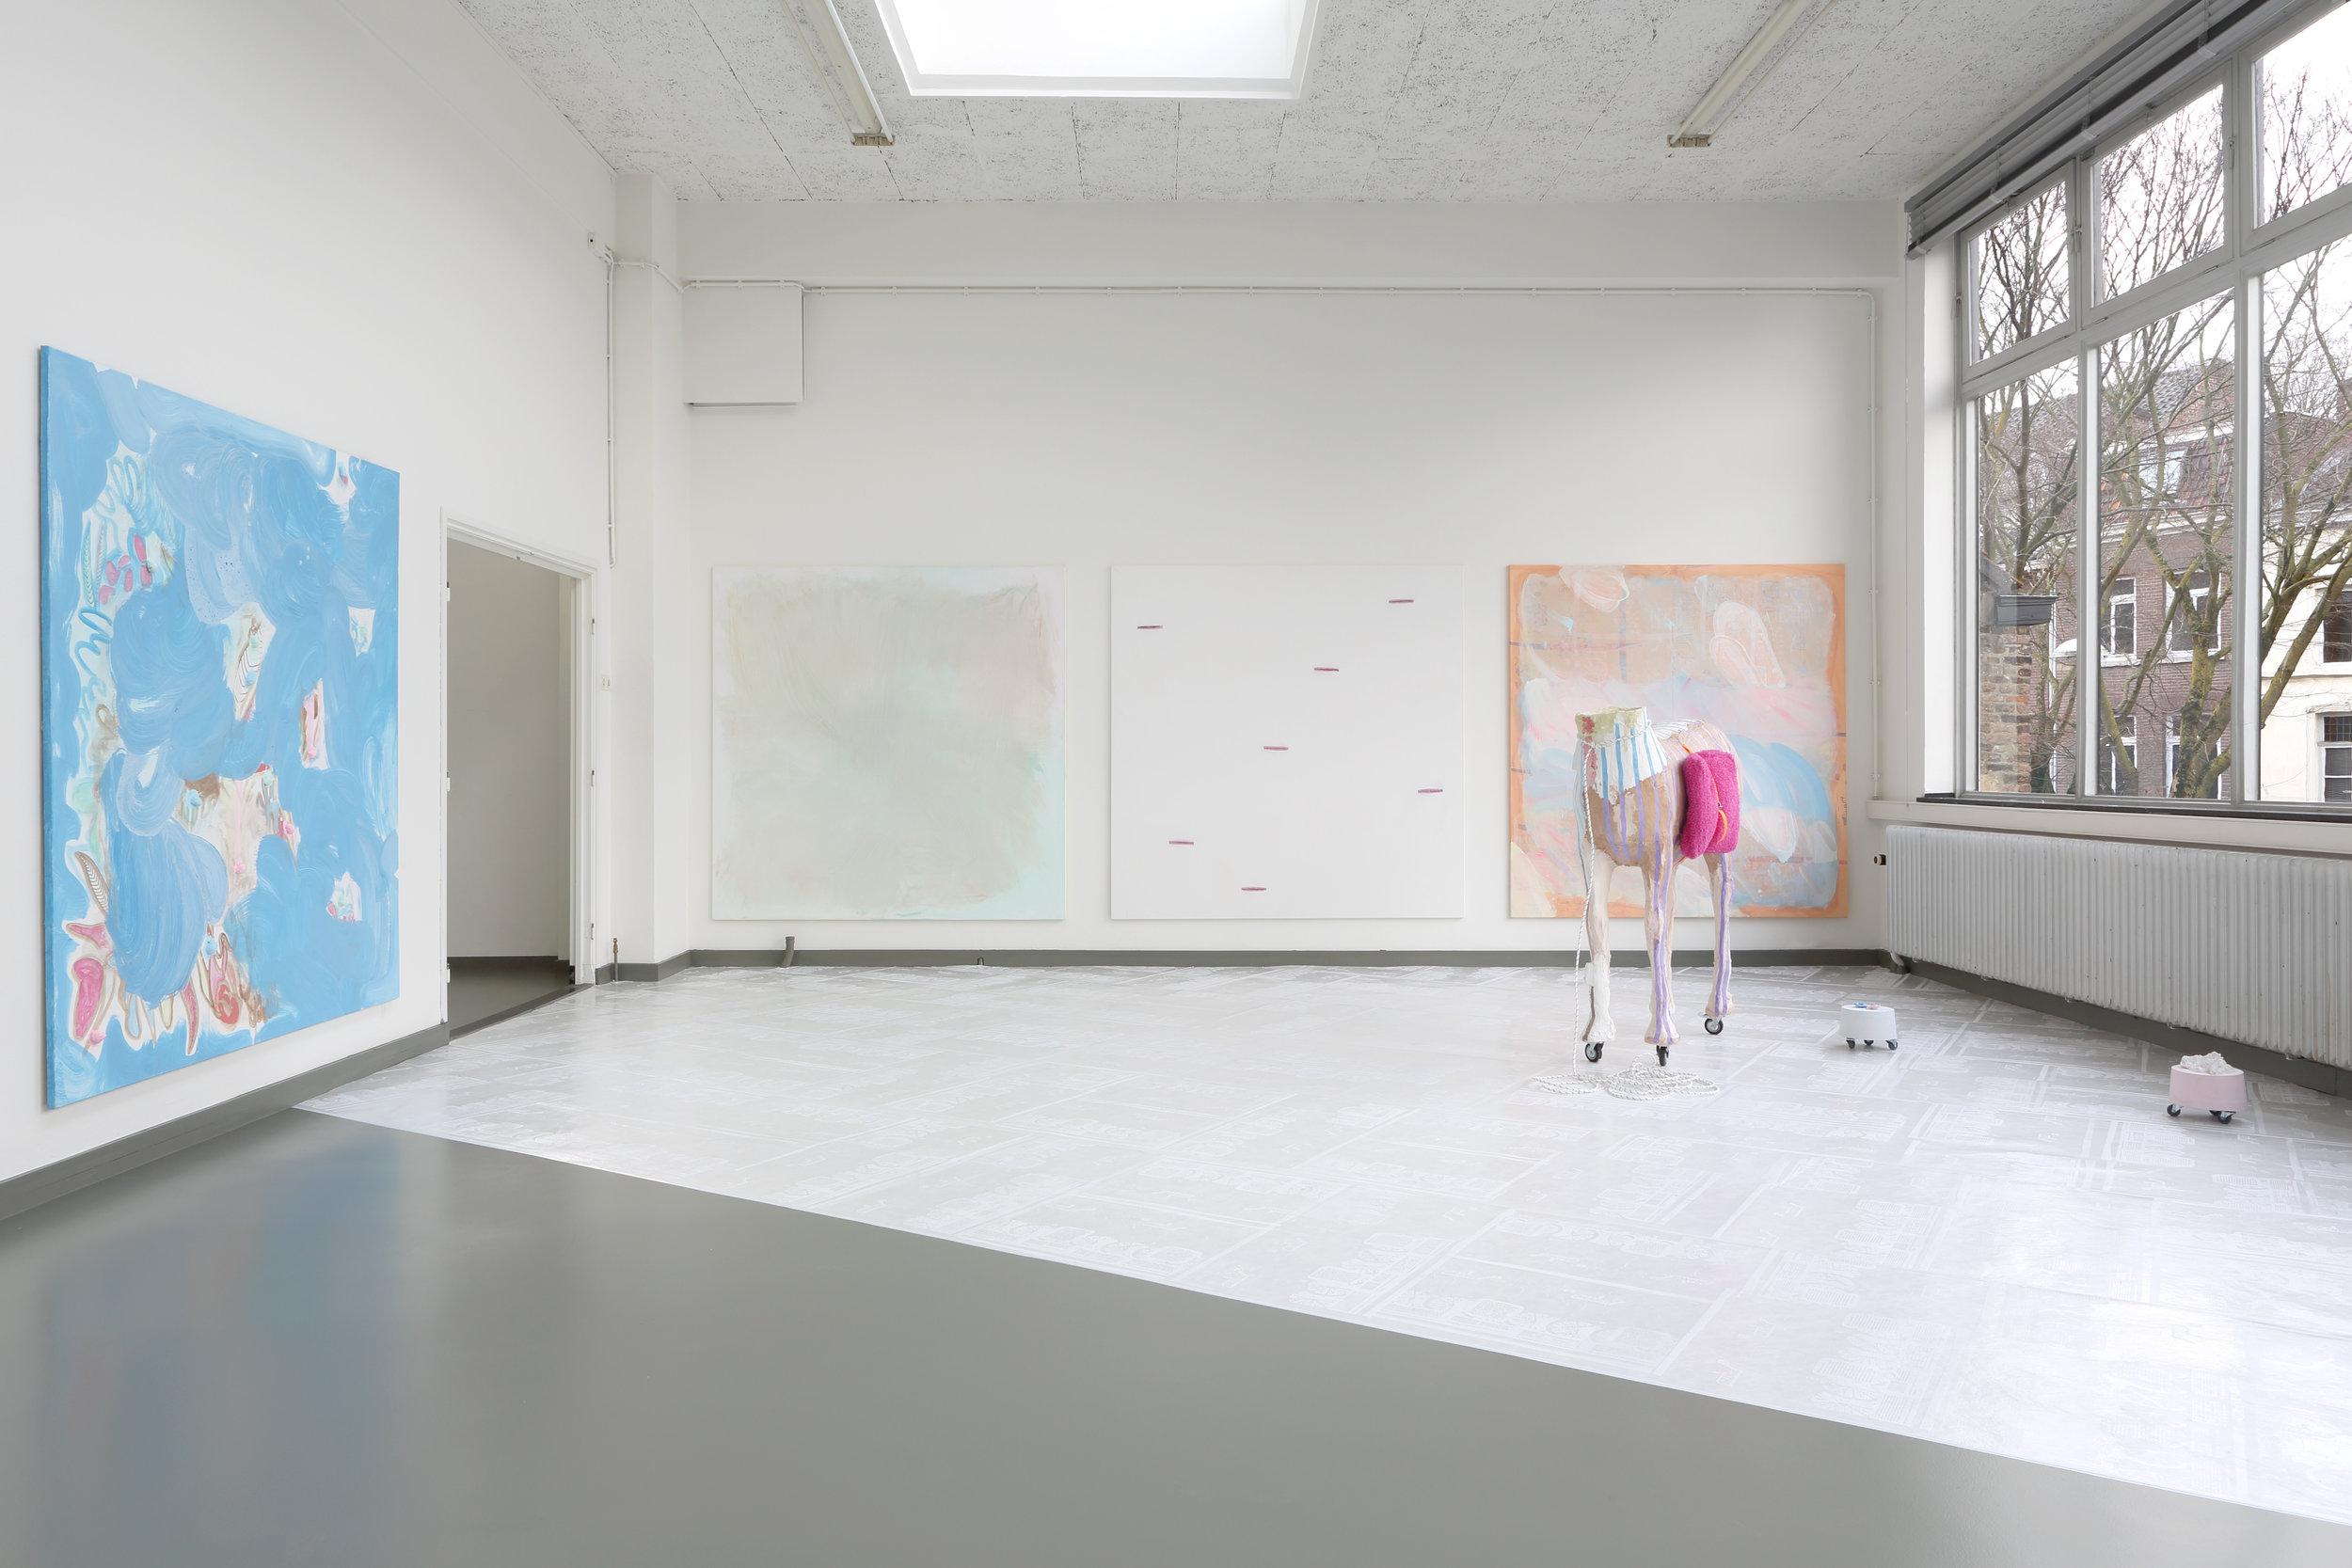 A stone is dropped, eggs mixed, pigments crushed.. - Open Studio's '18, Jan van Eyck Academie, 2018